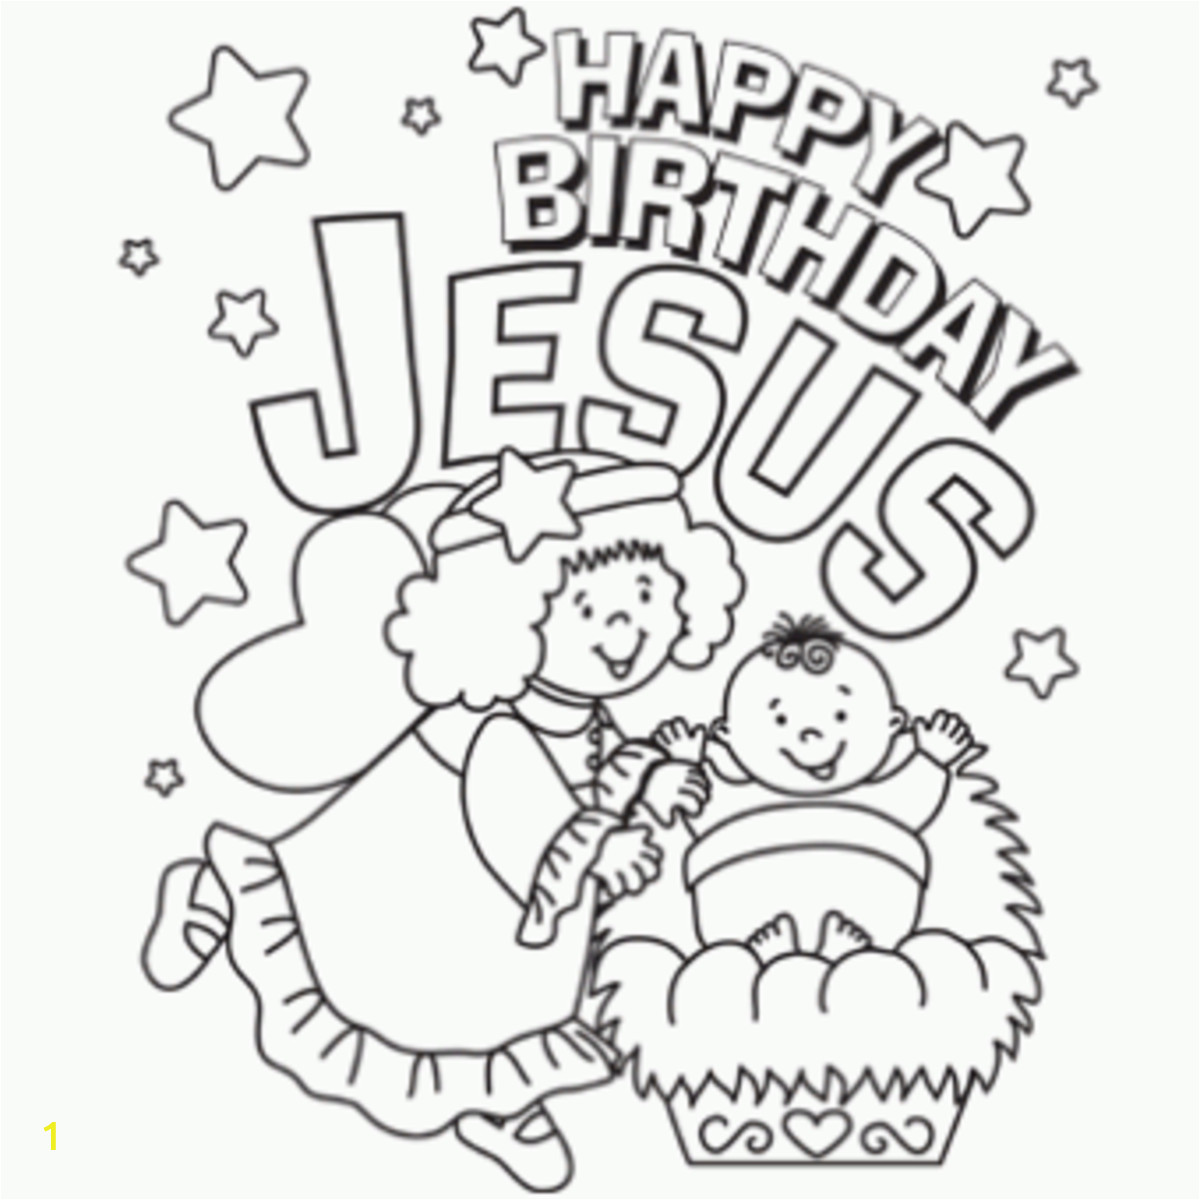 happybirthdayjesuschristmasclipart